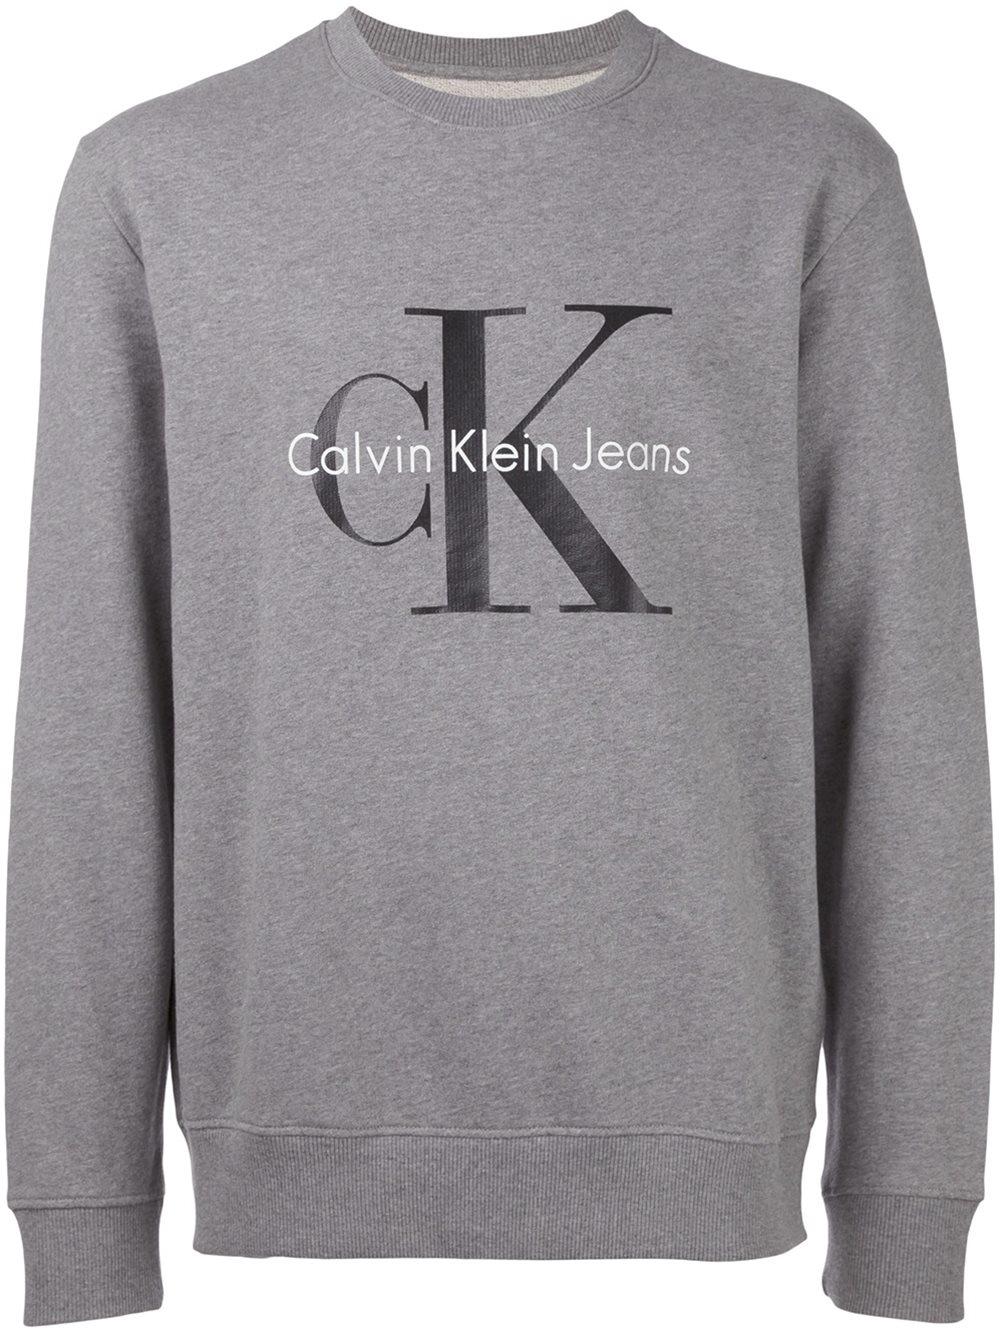 calvin klein jeans logo sweater long sweater jacket. Black Bedroom Furniture Sets. Home Design Ideas